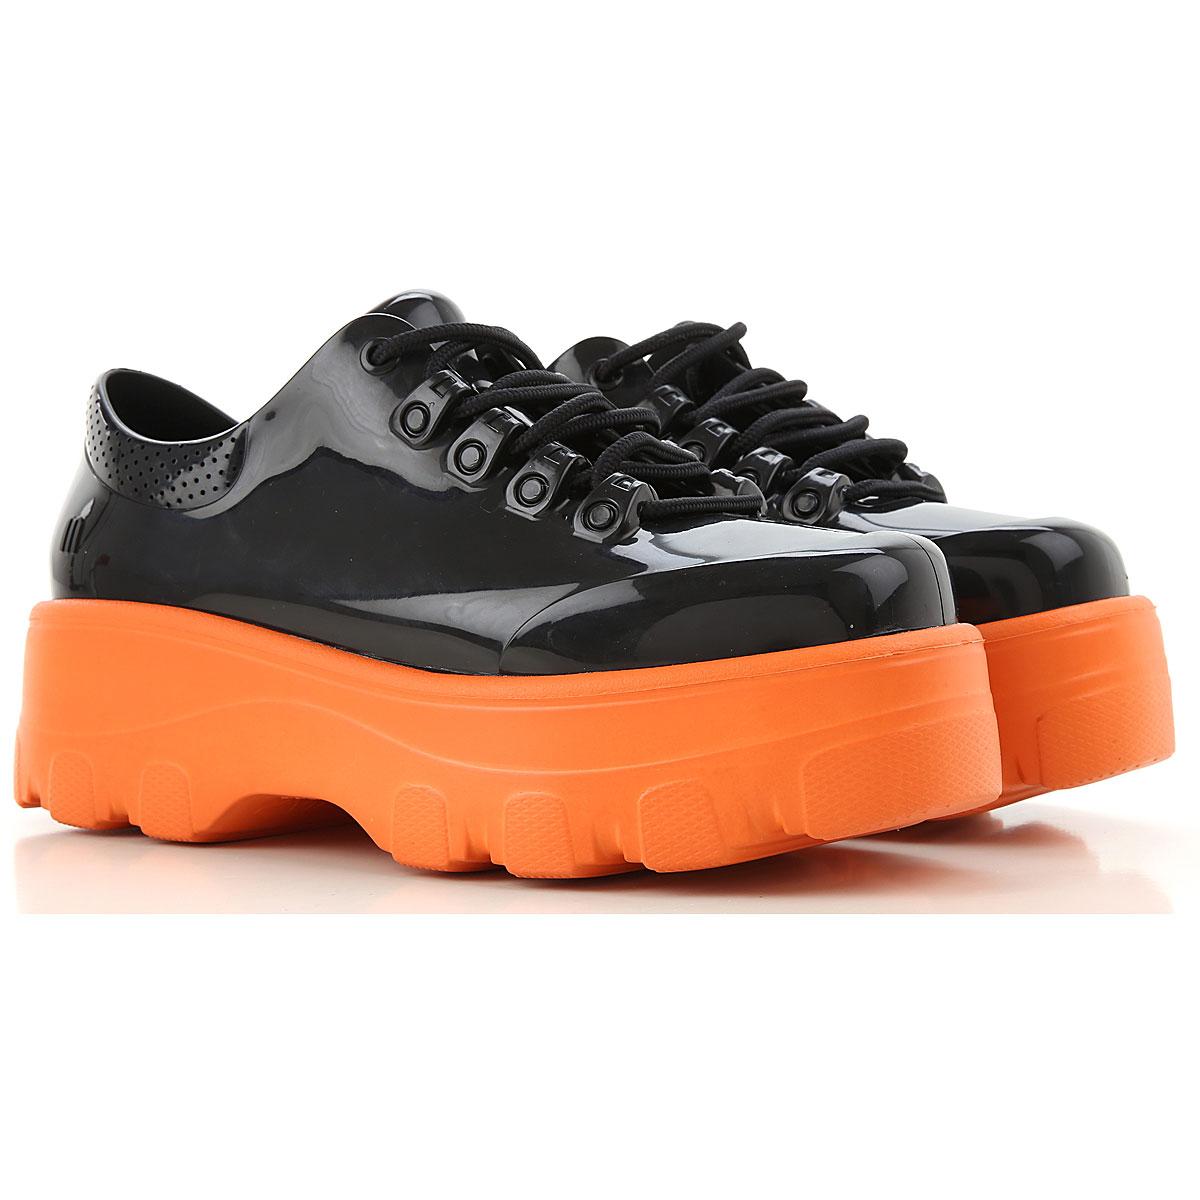 Melissa Lace Up Shoes for Men Oxfords, Derbies and Brogues On Sale, Black, PVC, 2019, USA 6 - EUR 37 USA 8 - EUR 39 USA 9 - EUR 40